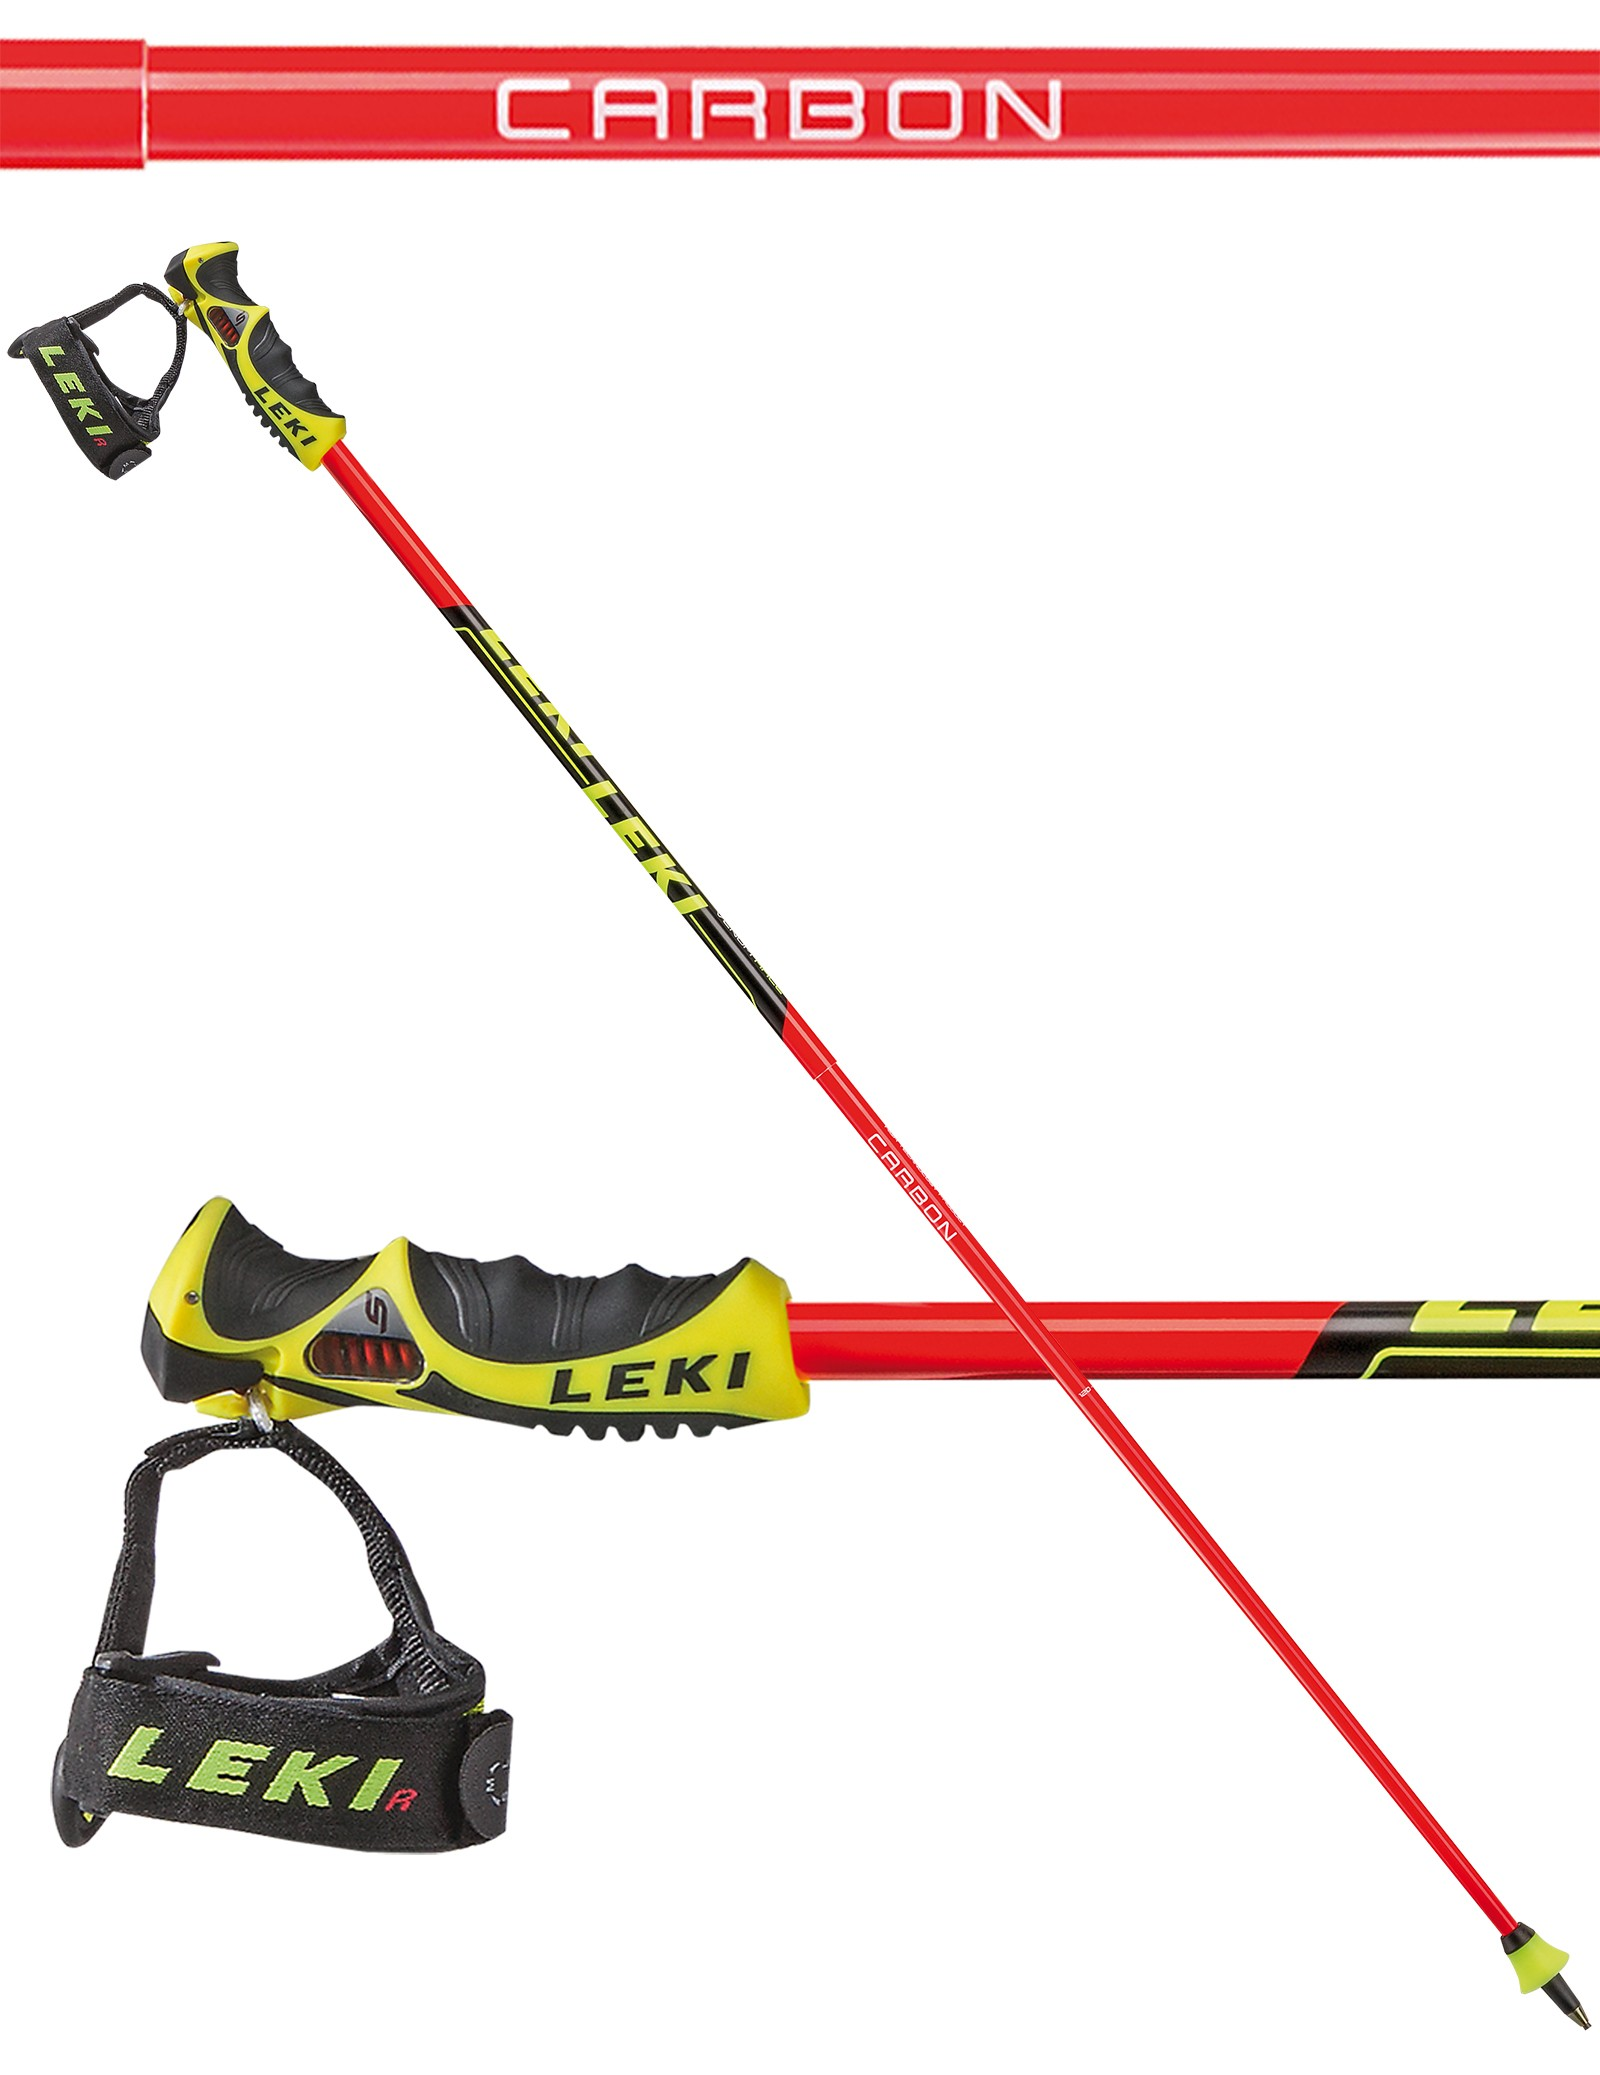 Leki Venom GS TRS ski poles, 2018